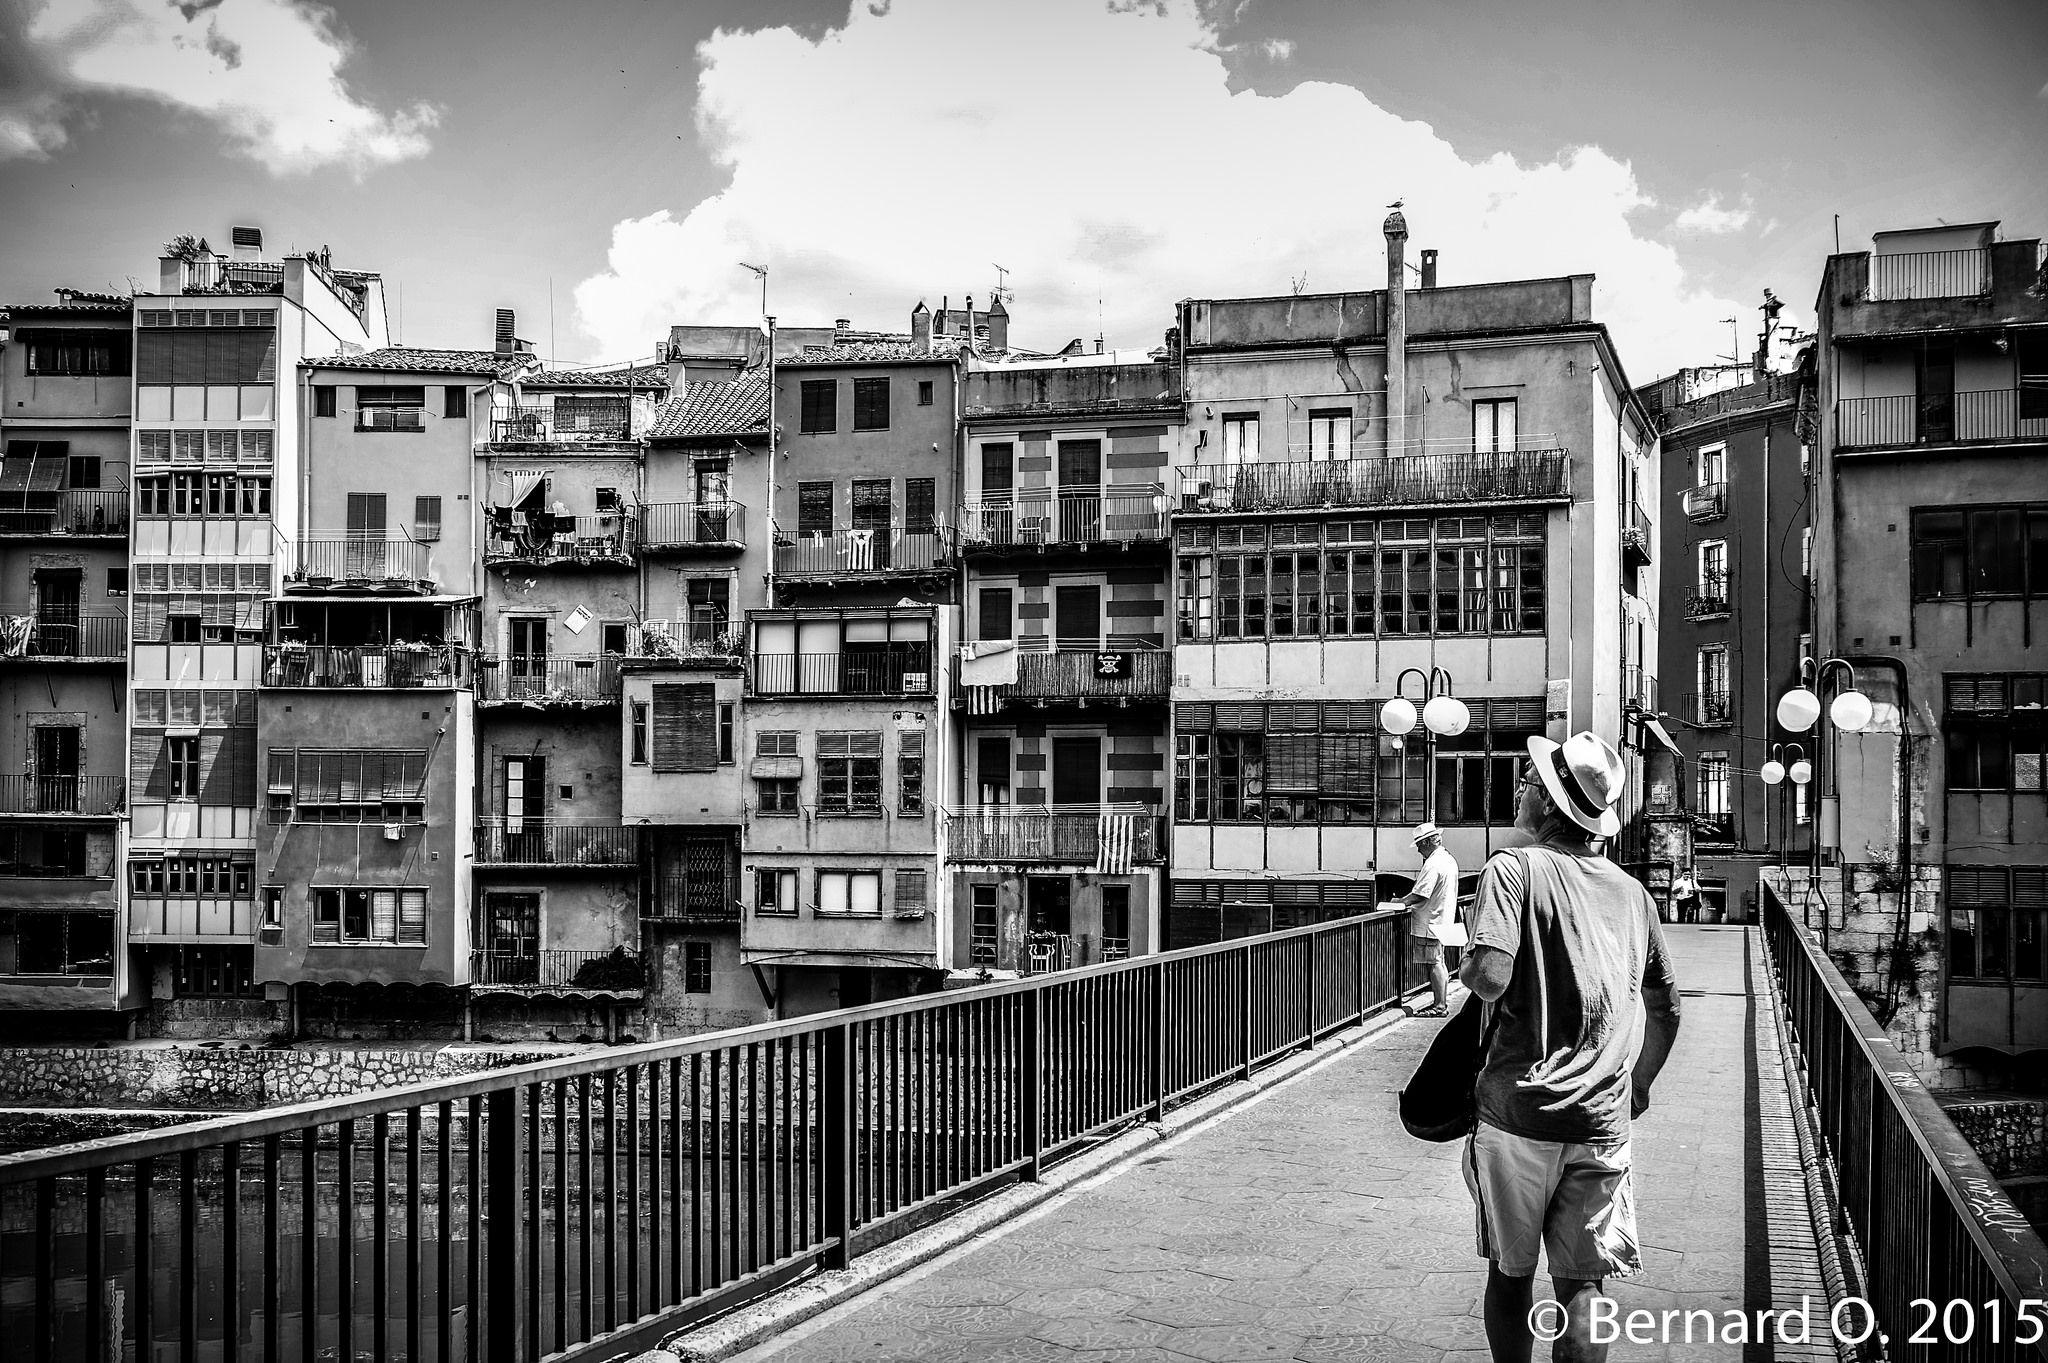 https://flic.kr/p/s5UAh9 | Girone, sur le Rio Onyar (Catalogne)